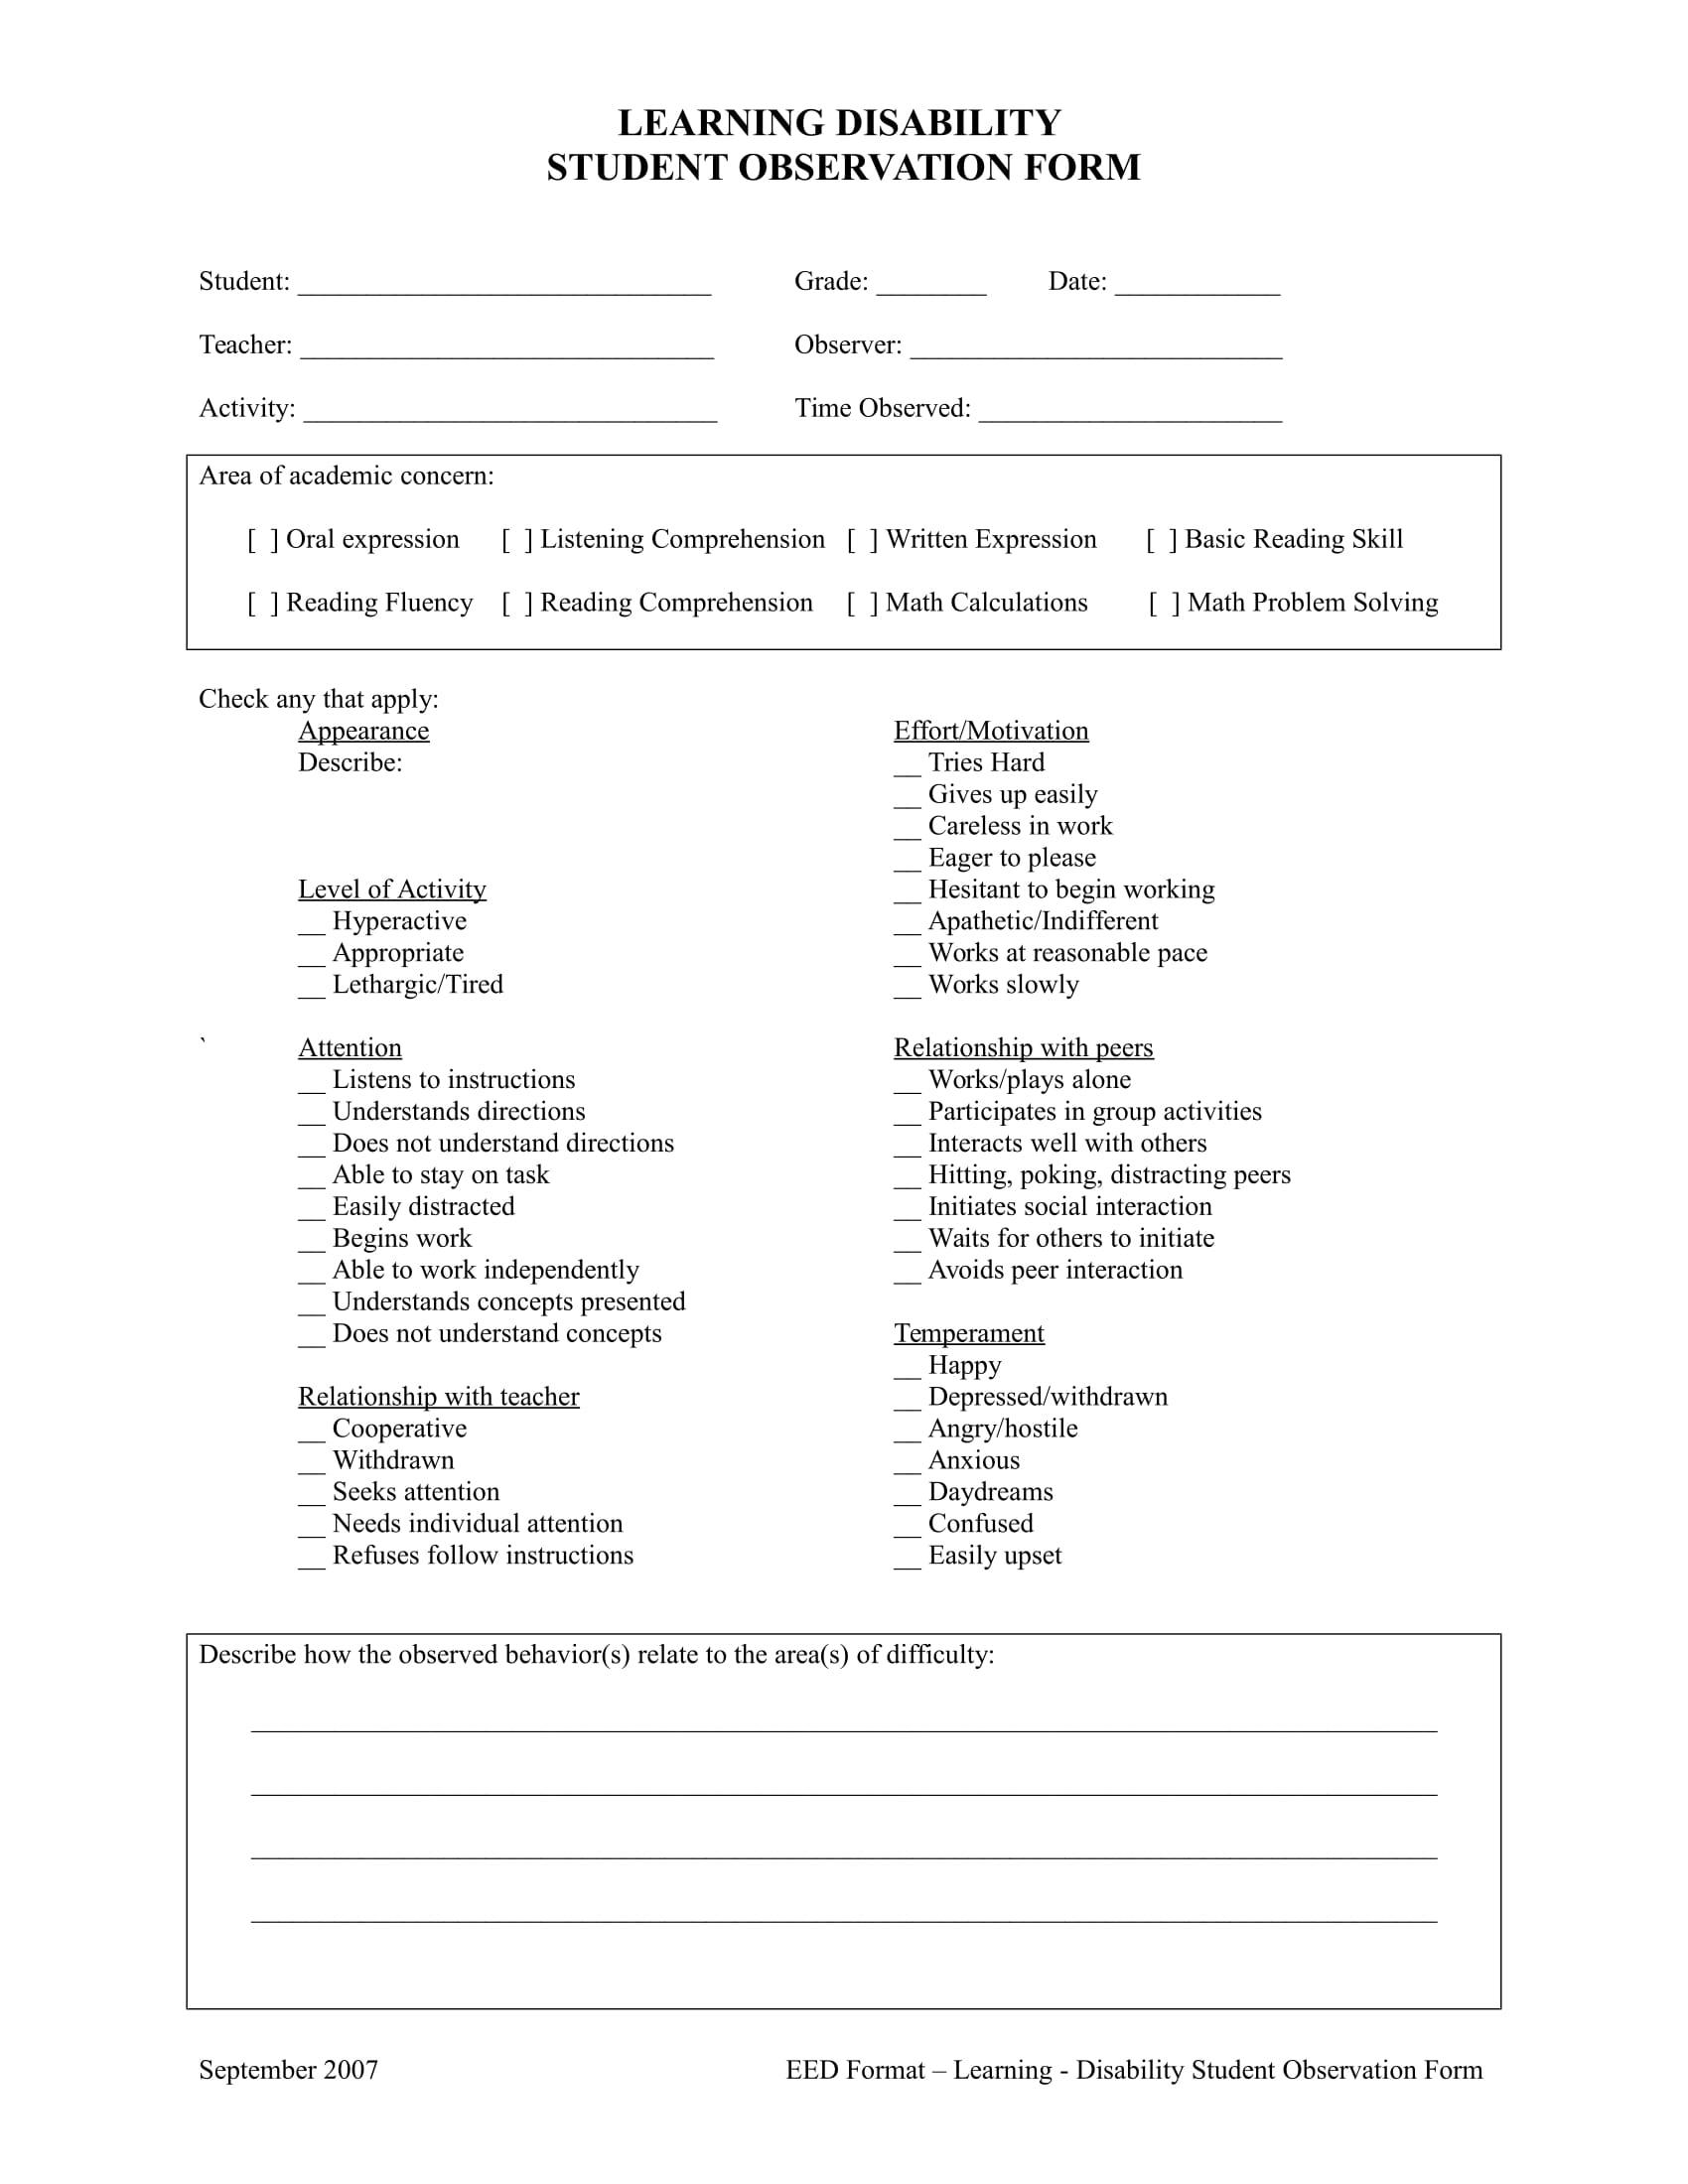 student observation form in doc 1